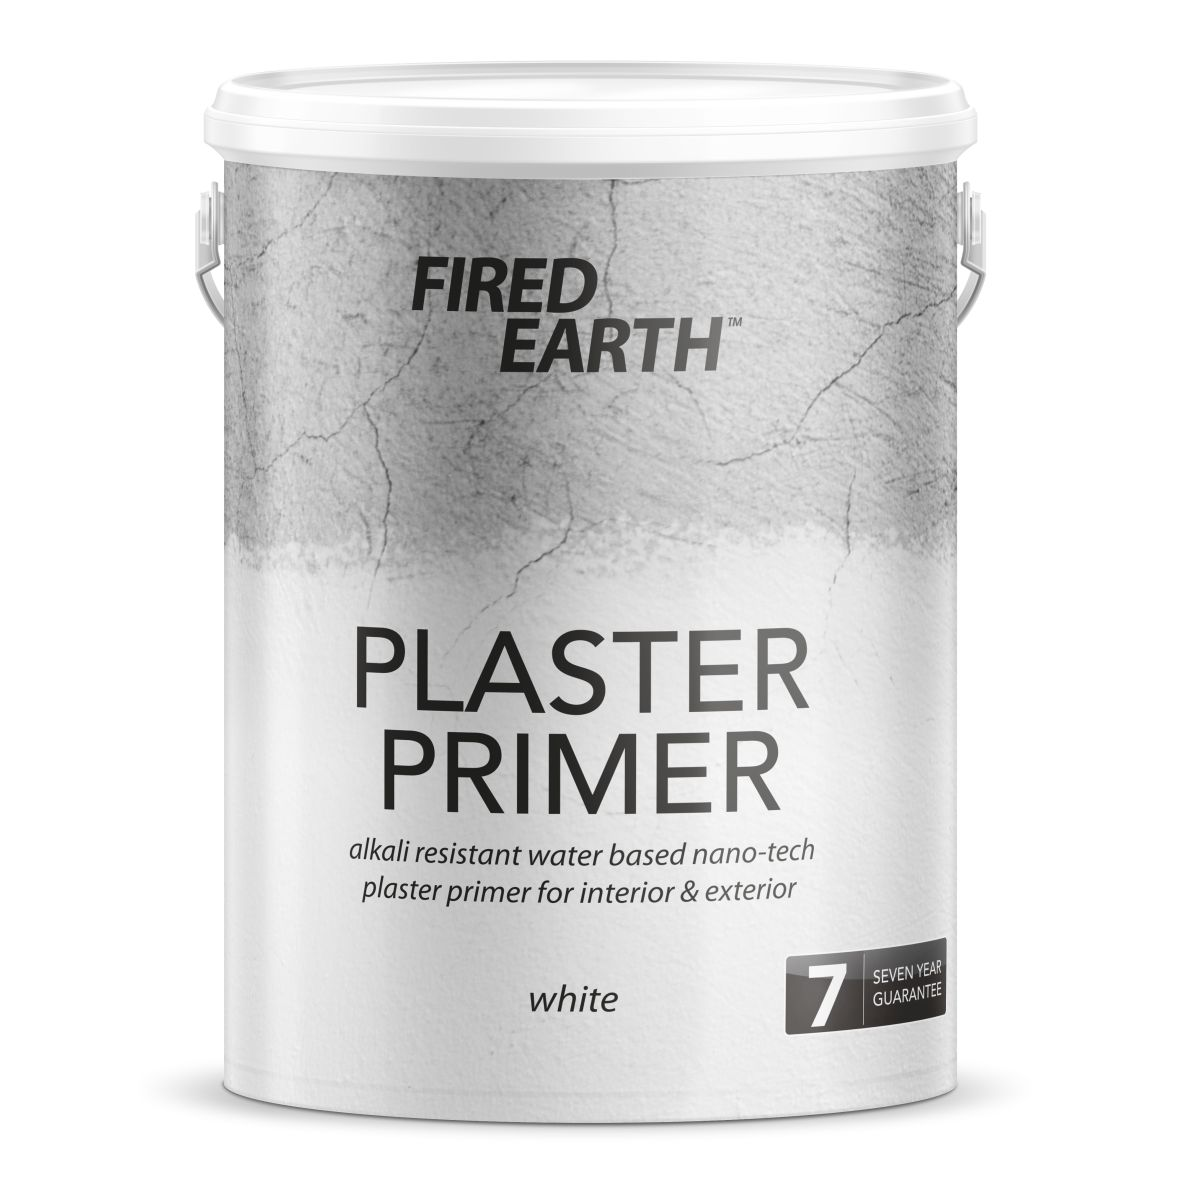 Copy of FE Plaster Primer